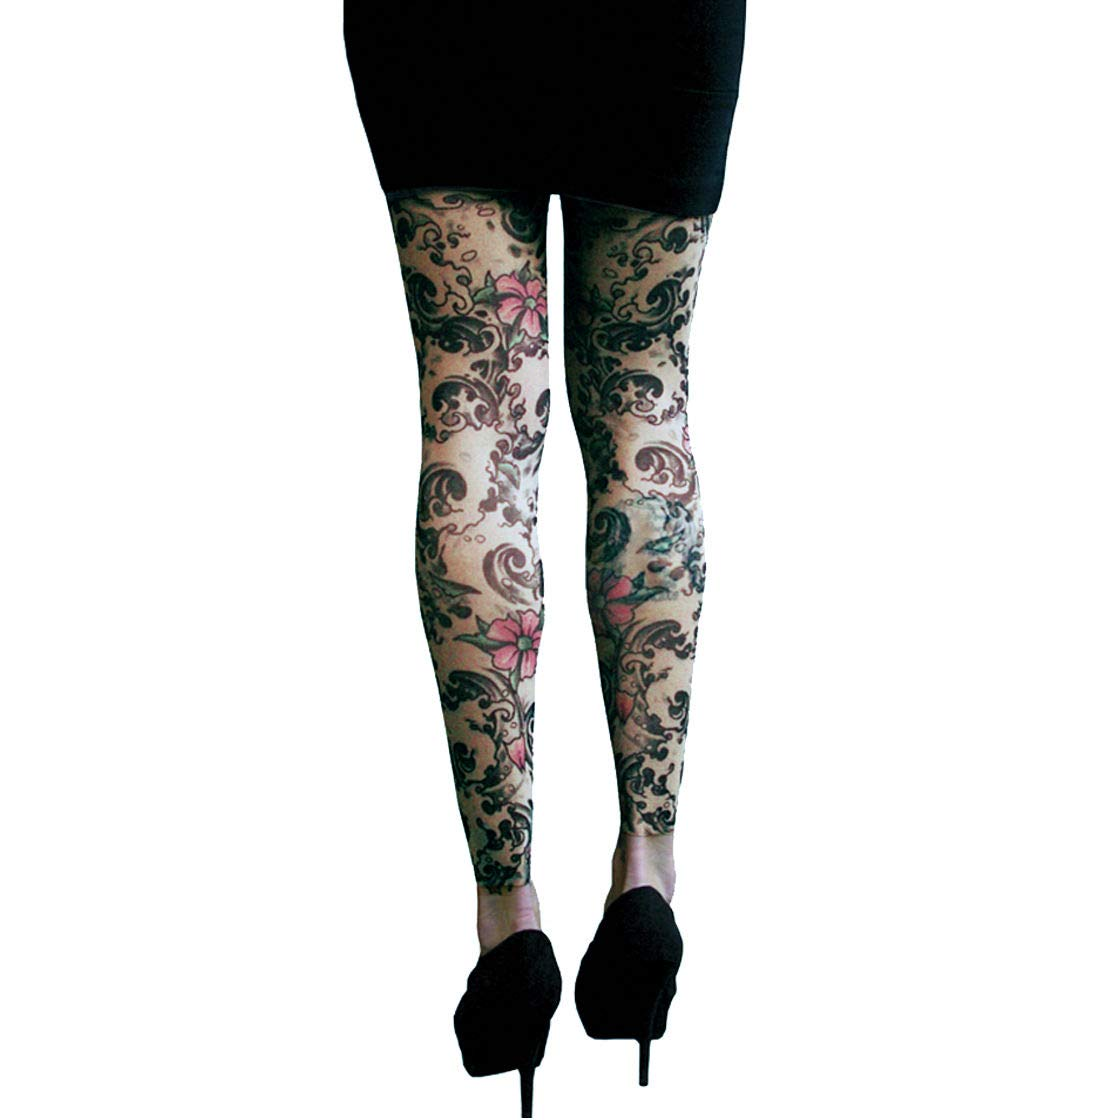 d4302f2f13f74 Wild Rose 102 Ladies Tattoo Illusion Mesh Leggings Footless Tights, Tan:  Amazon.co.uk: Clothing